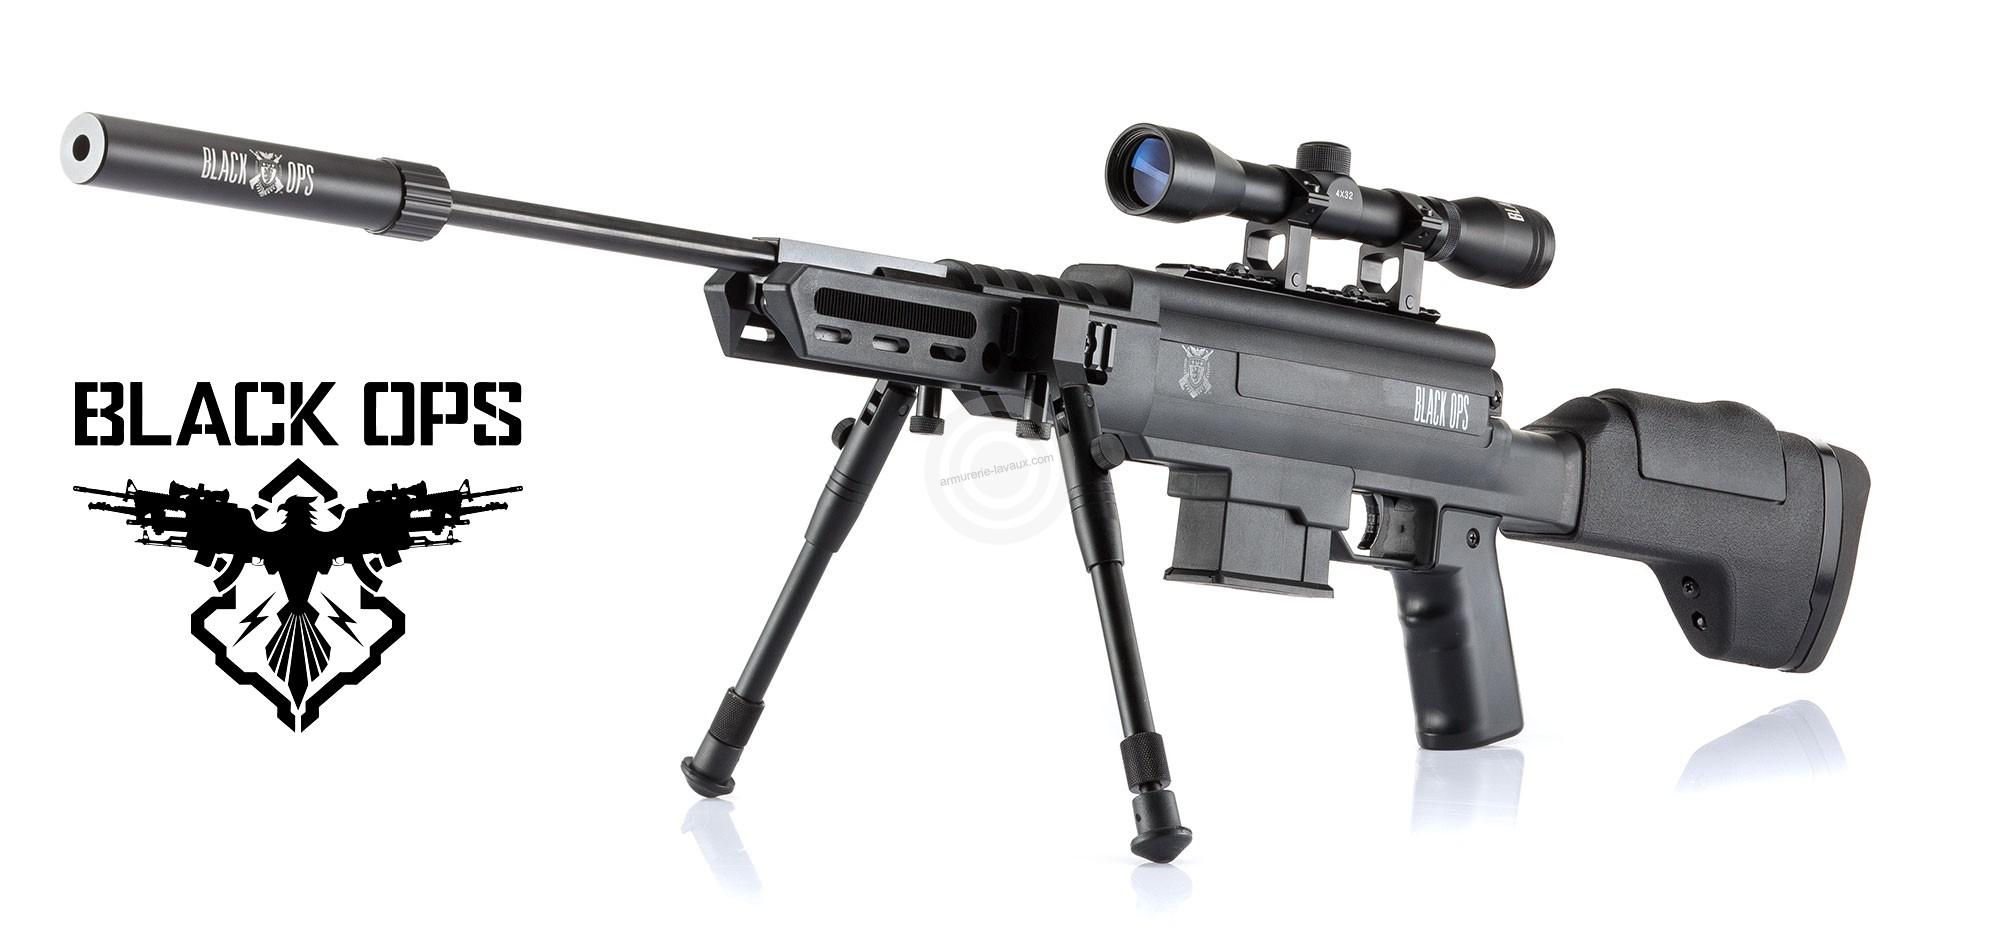 carabine plombs black ops sniper tactical cal 4 5mm armes de loisirs sur armurerie lavaux. Black Bedroom Furniture Sets. Home Design Ideas